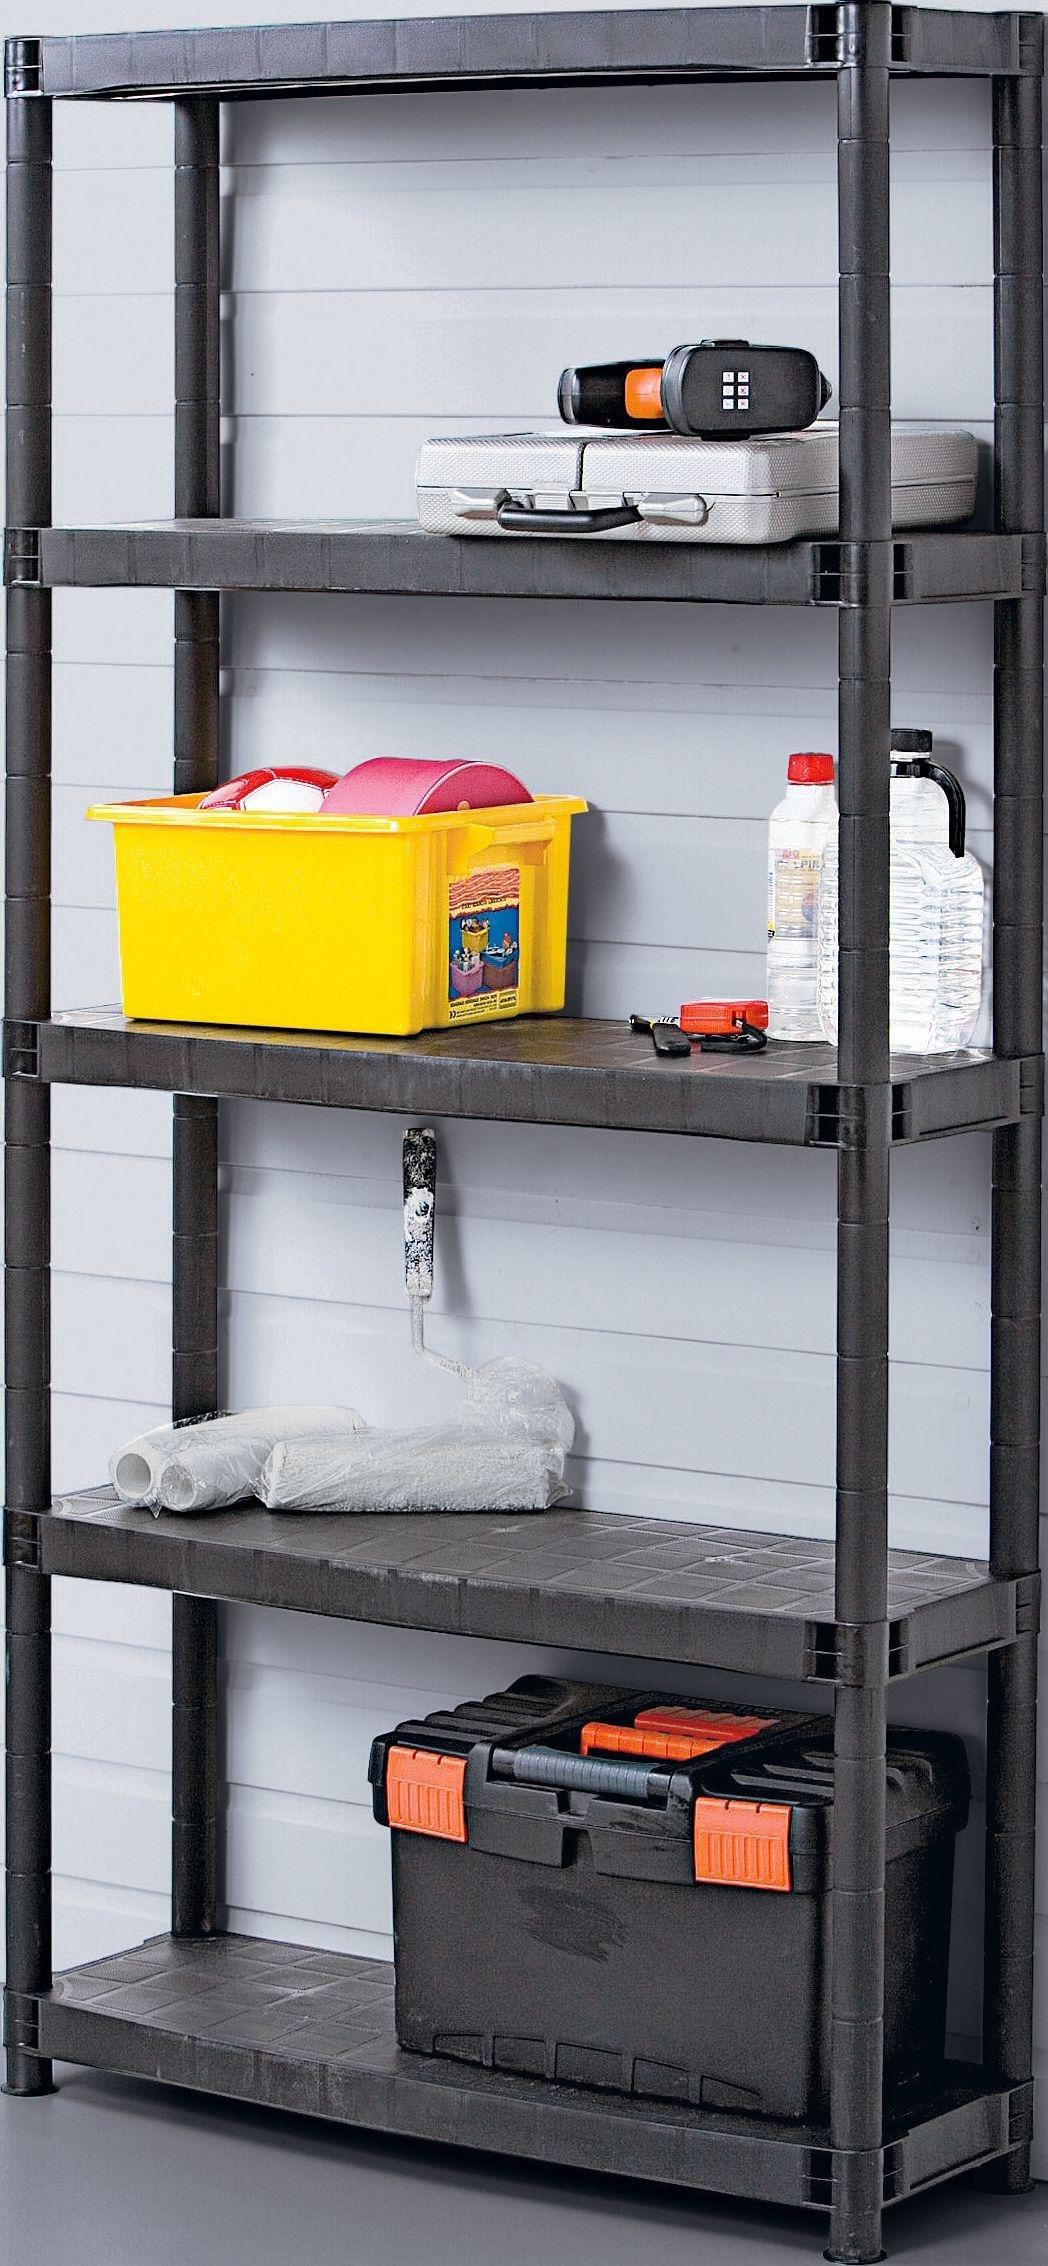 5 tier shelving unit review. Black Bedroom Furniture Sets. Home Design Ideas